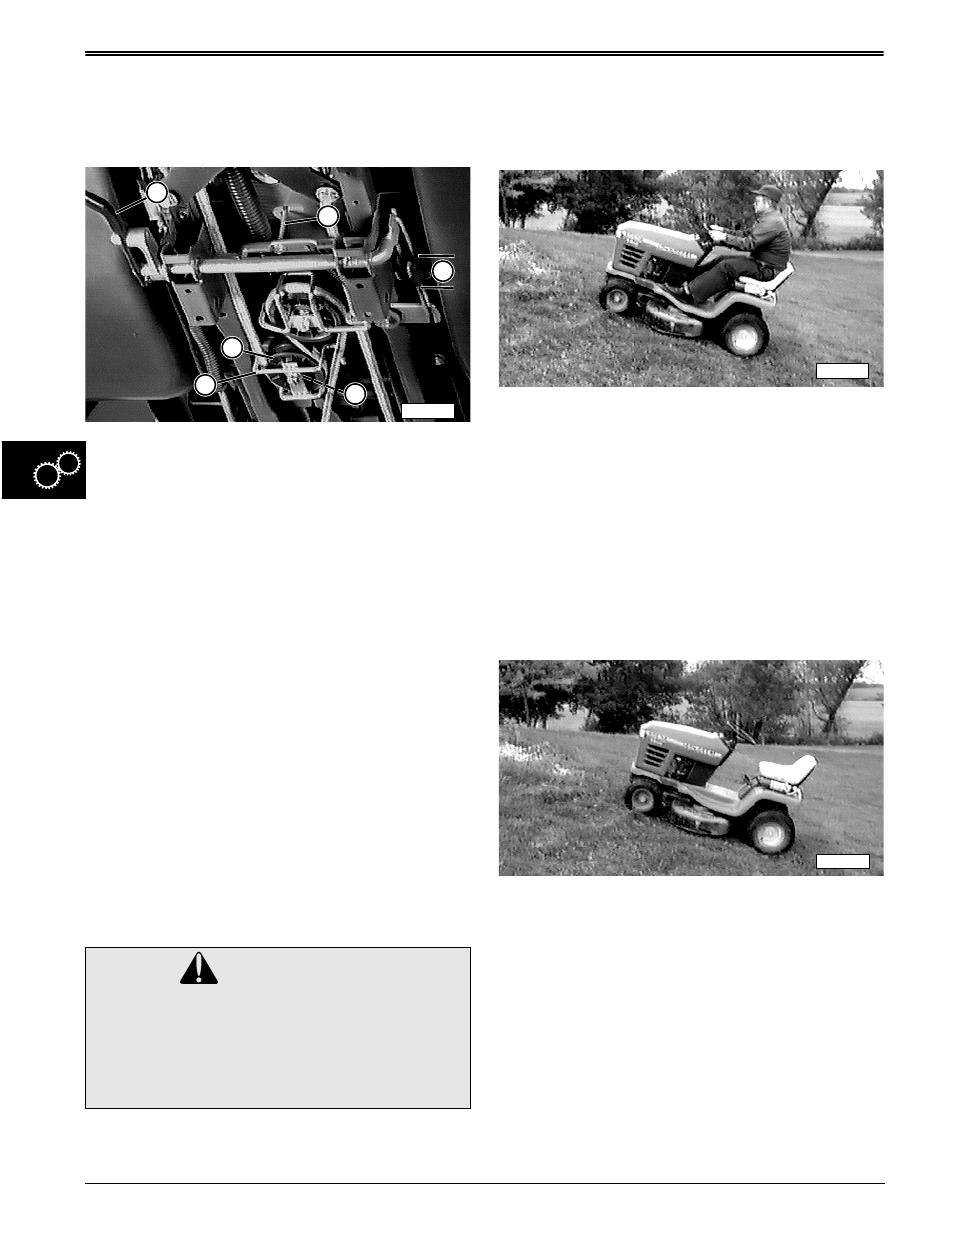 Caution Clutch Spring Adjustment John Deere Stx38 User Manual Transmission Diagram Brake And Pedal Parts Page 200 314